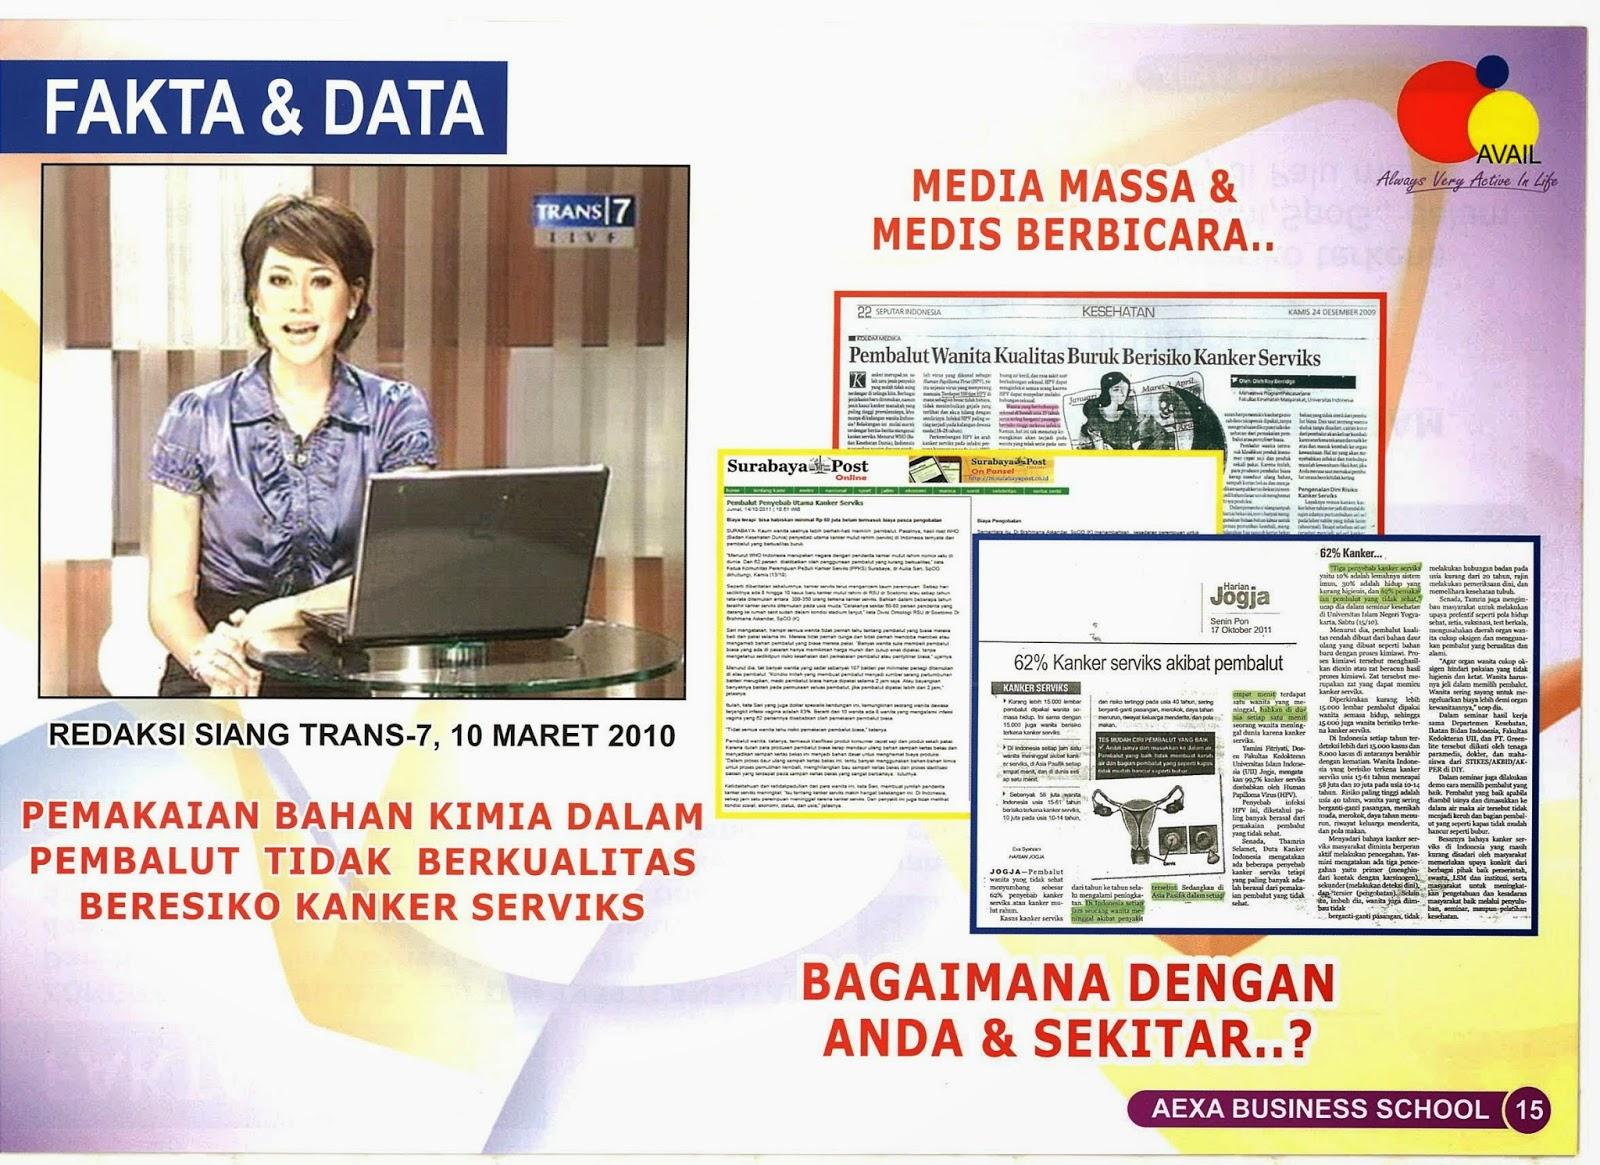 Fakta dan data pembalut murah berbahaya